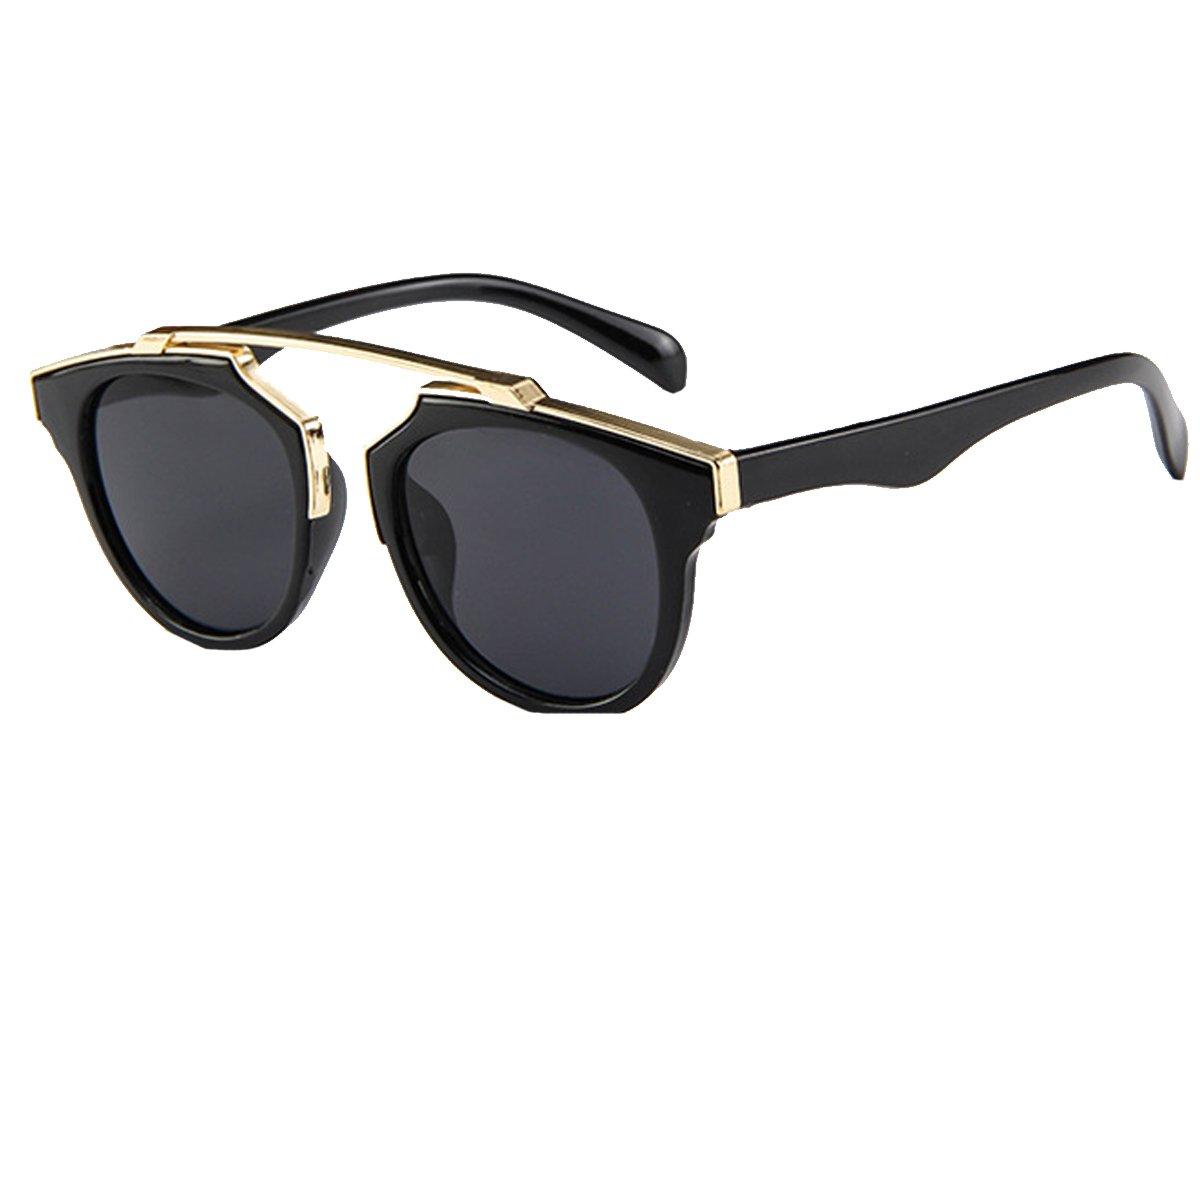 LABANCA Kids Chic Flat Lenses UV Protection Sunglasses Fashion Style Sunglasses Eyes Protection Eyewear for Boys and Girls Children